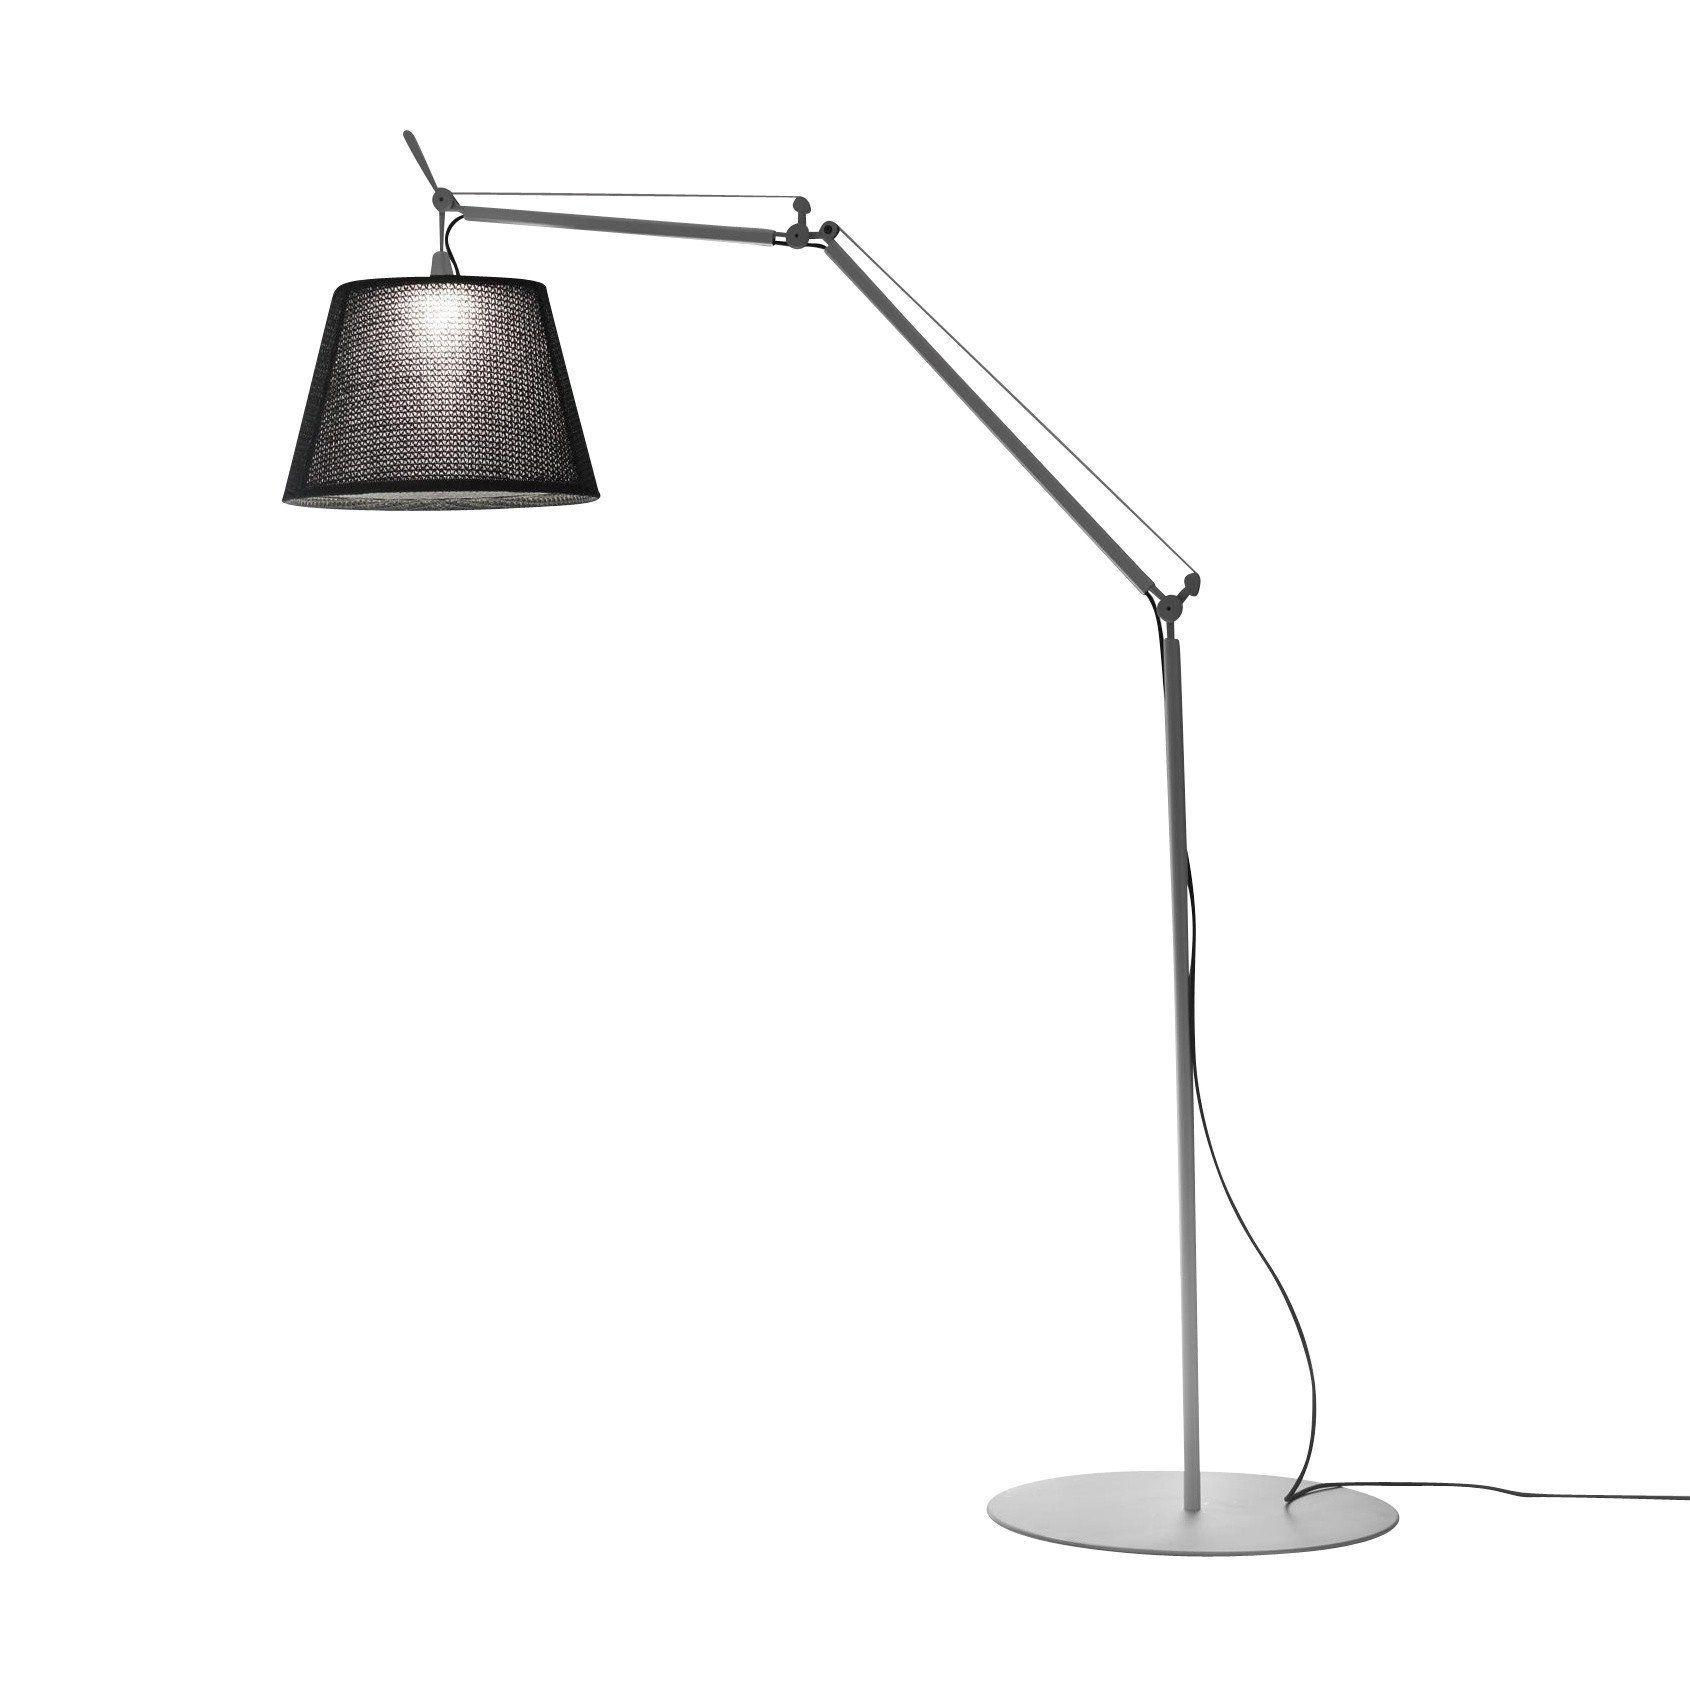 Tolomeo paralume lampadaire led artemide for Imitazioni lampade design